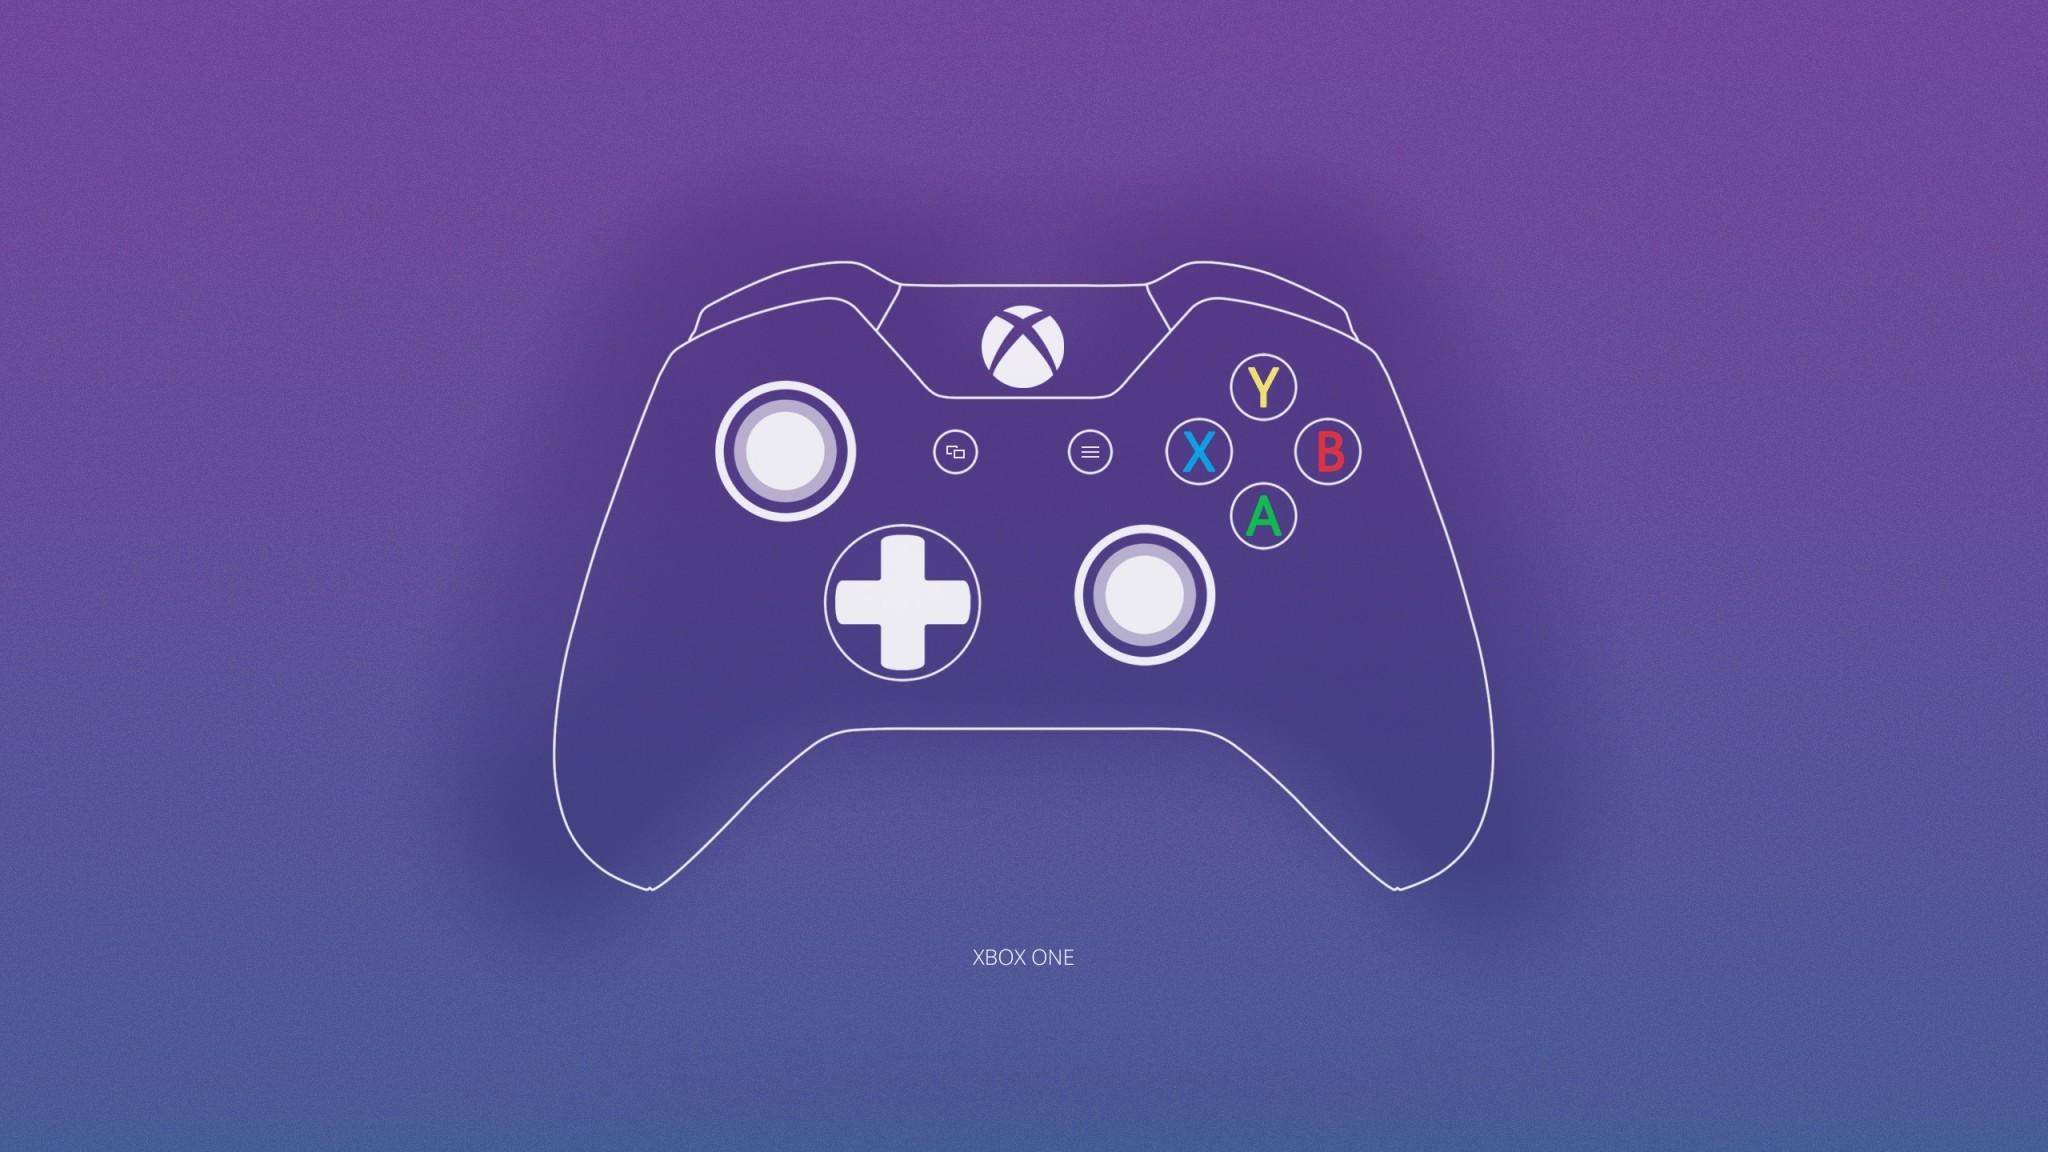 Xbox Wallpaper 21 2048x1152